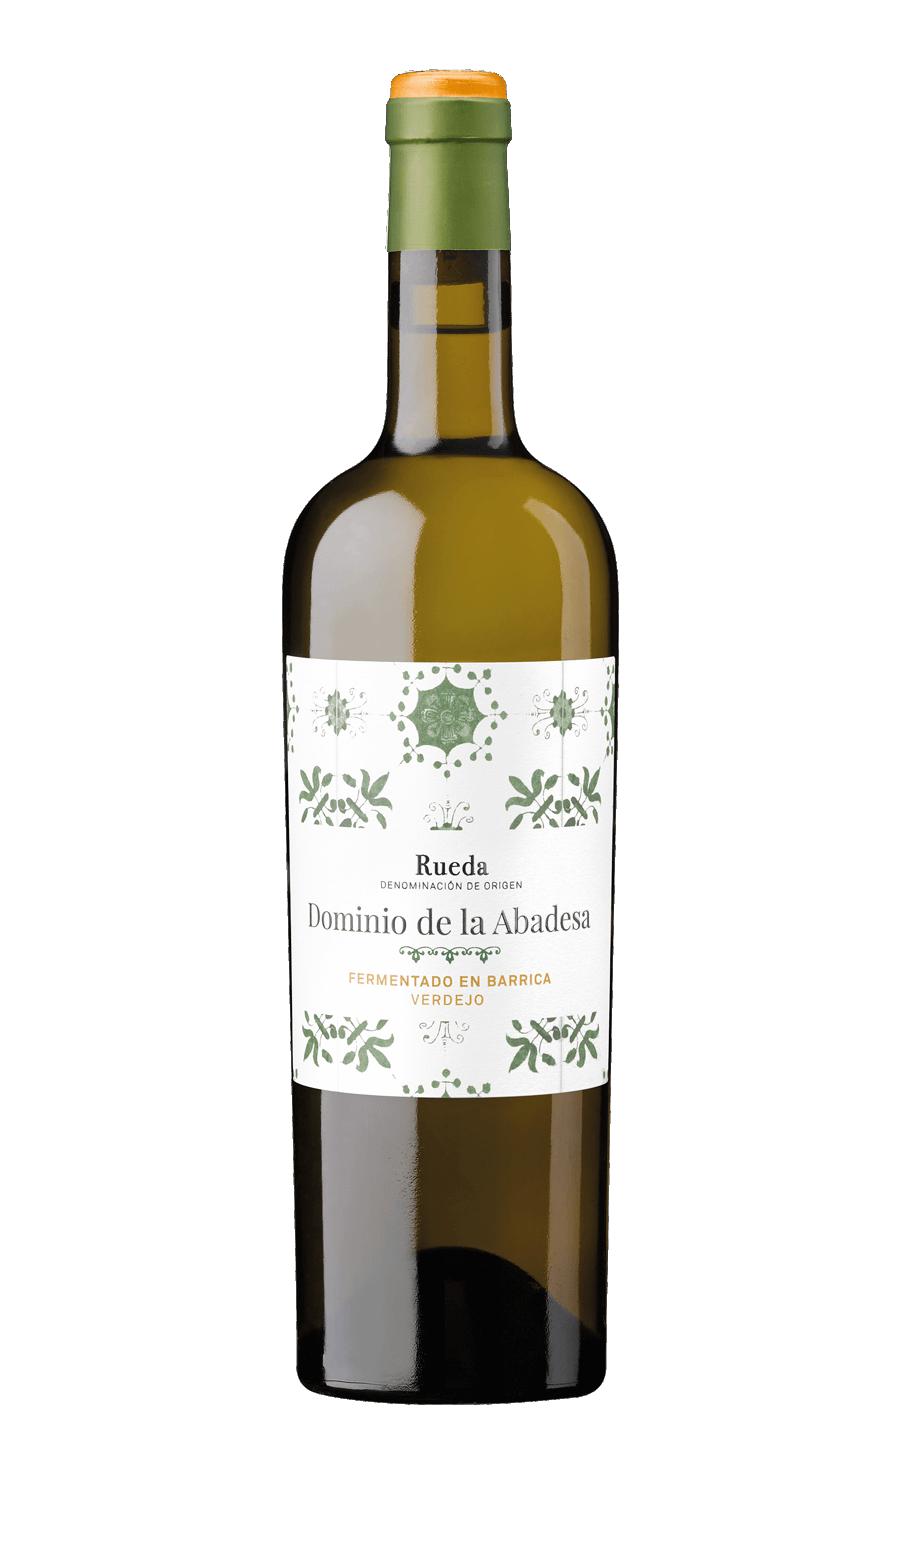 Dominio de la Abadesa Verdejo Fermentado en Barrica de Culto al Vino - Bodegas Ontañón - Bodegas